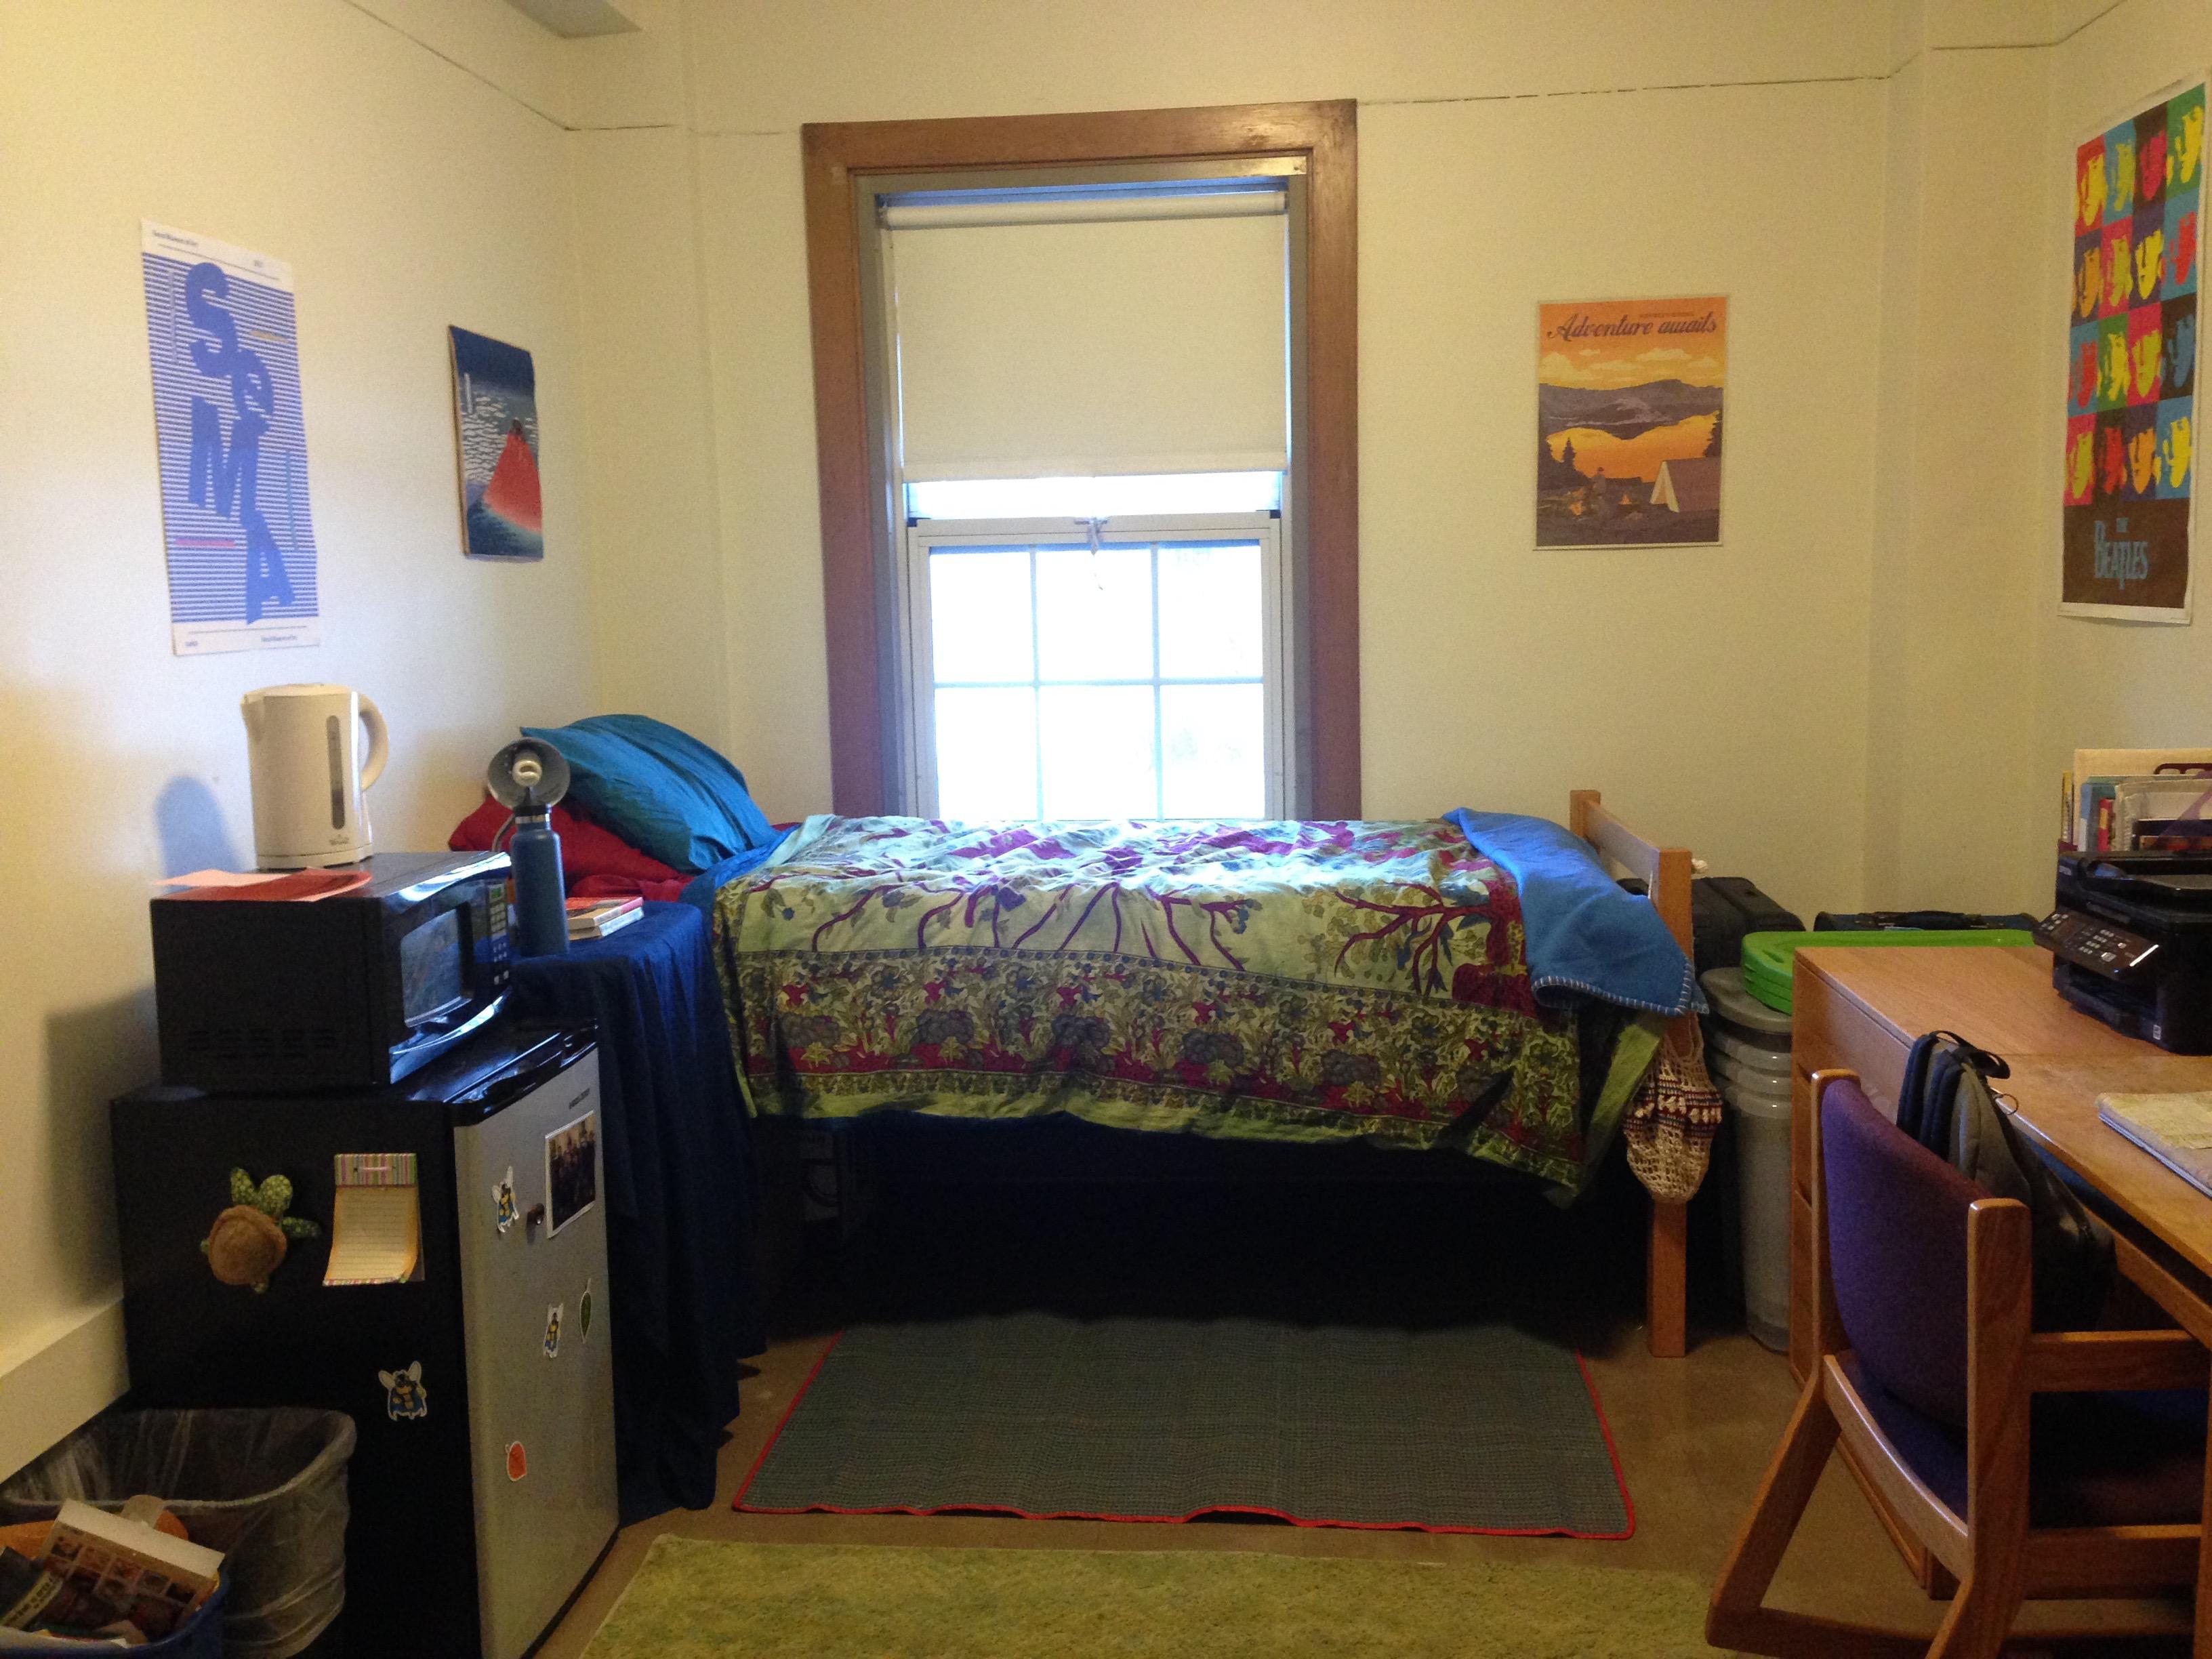 Junior Year Dorm